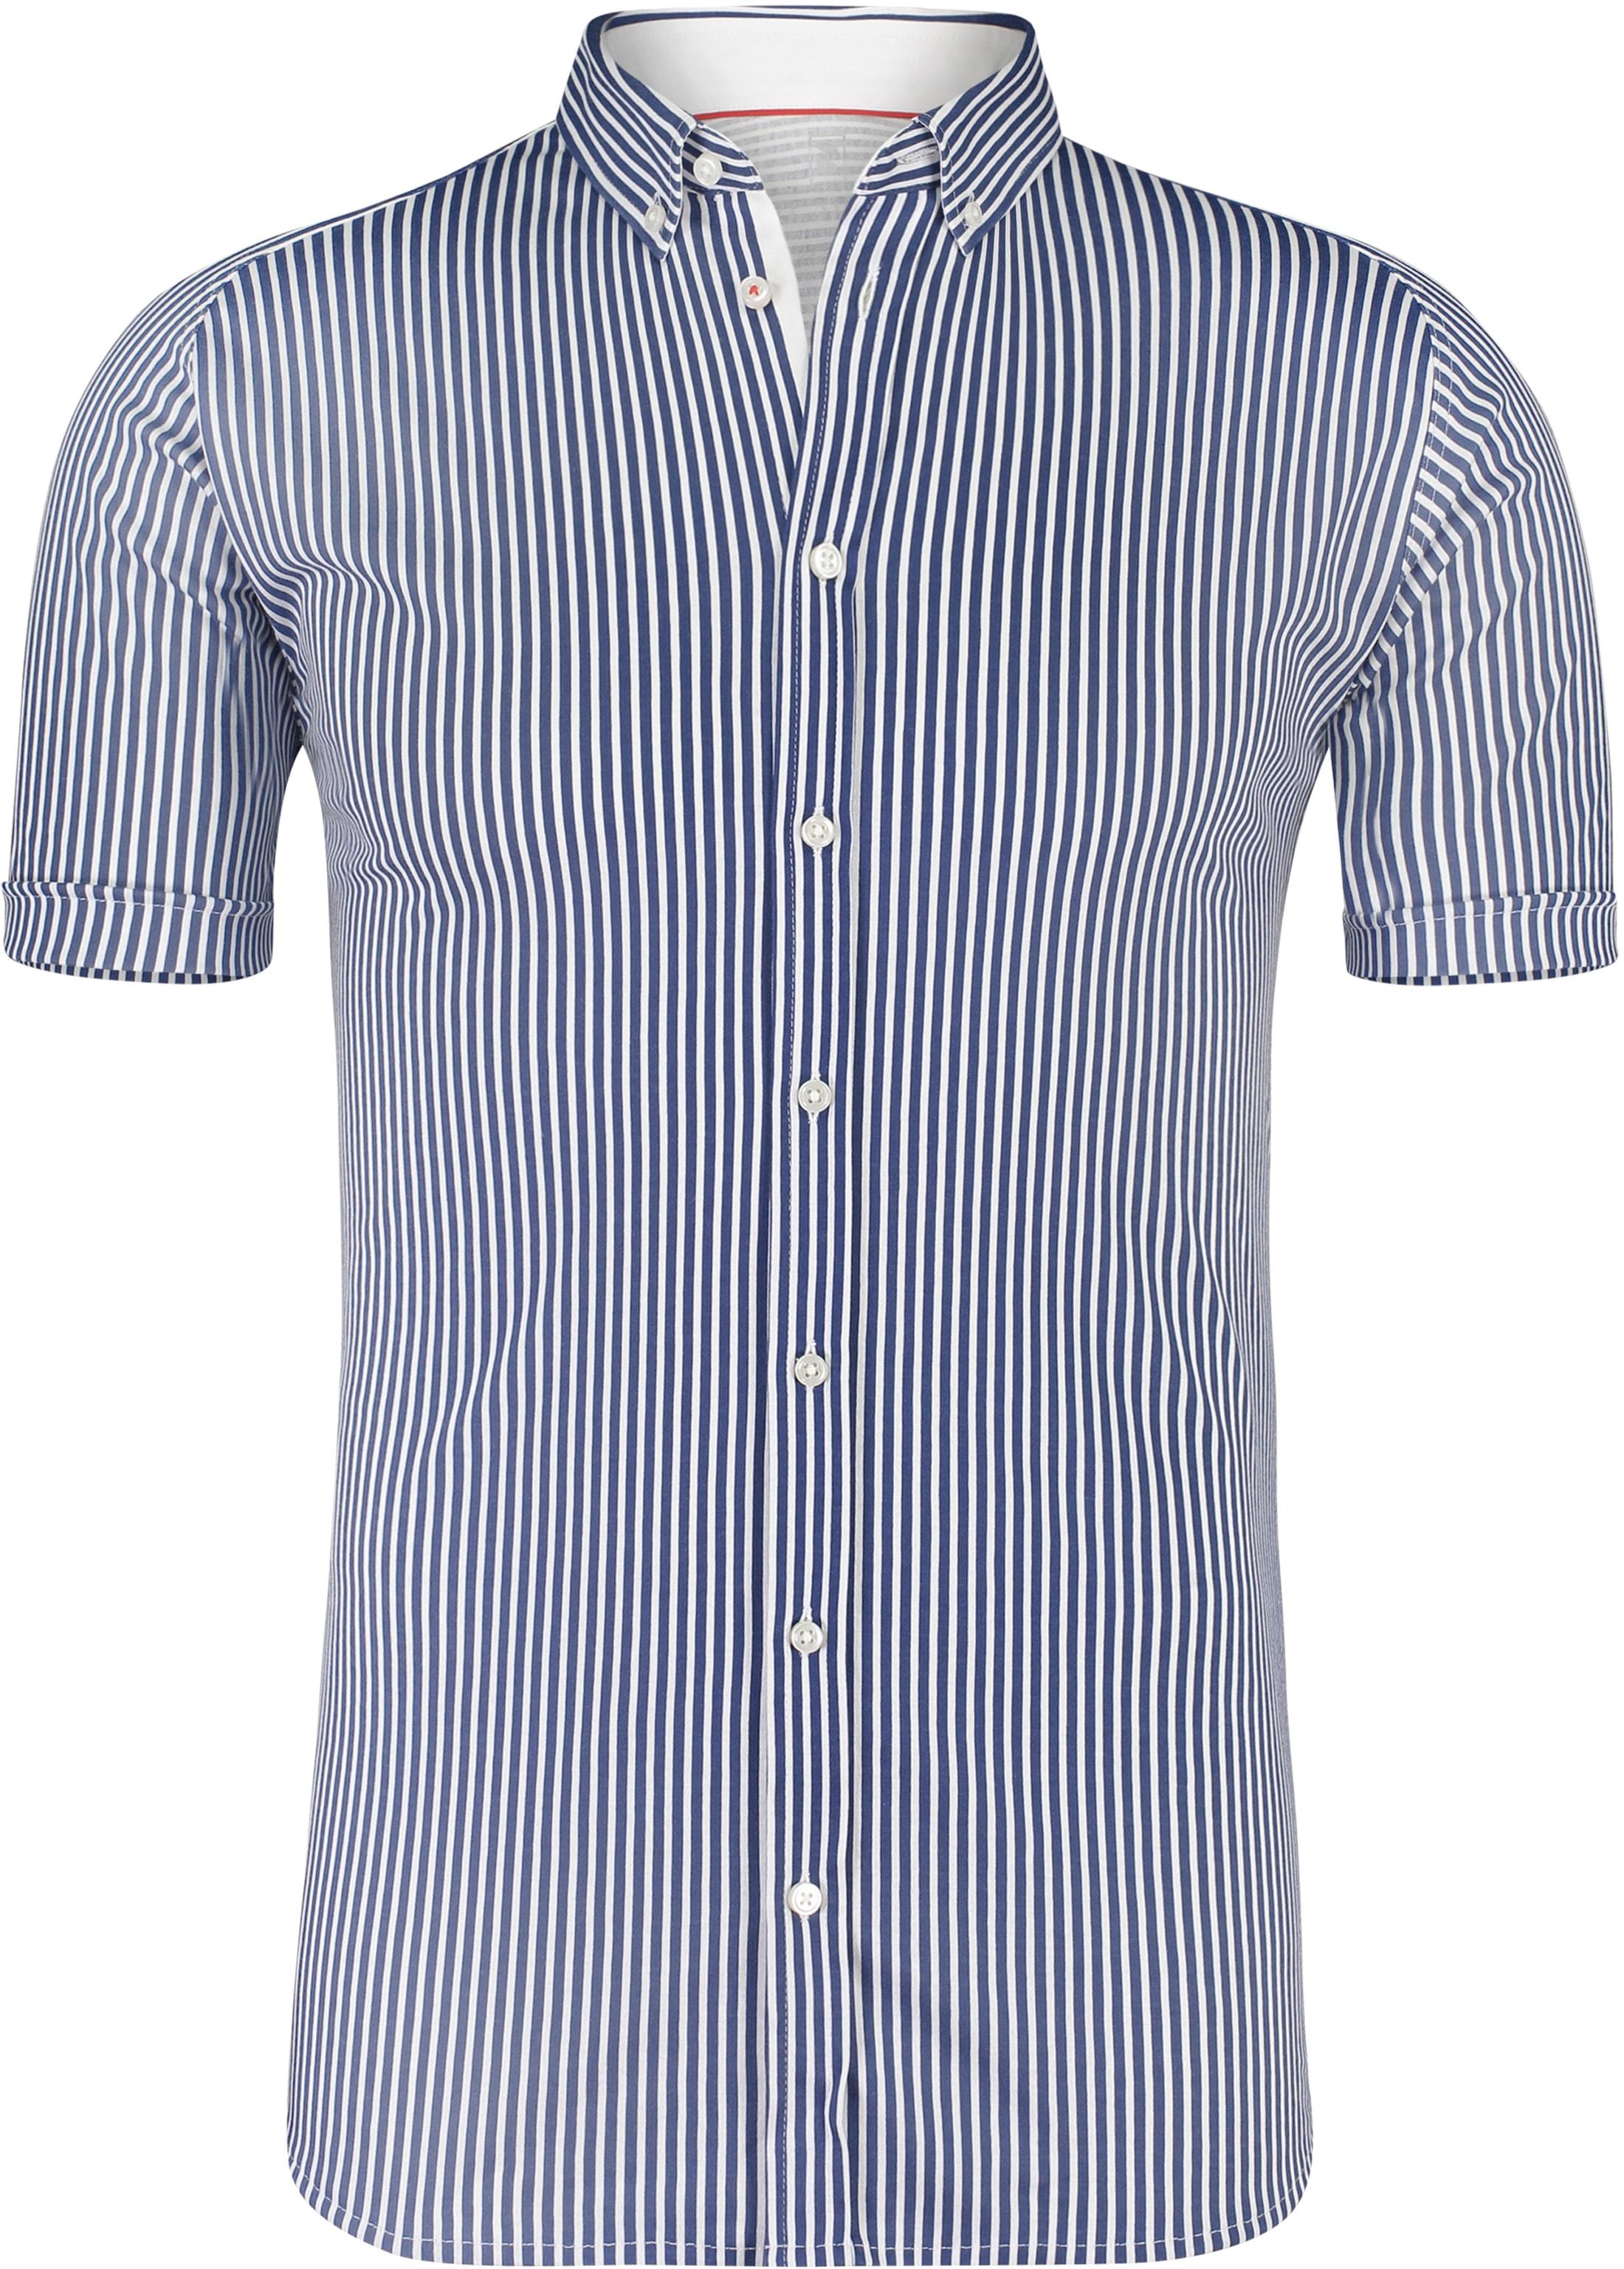 e52f8e681301 Desoto Shirt Short Sleeve Striped Navy 21133-3-054 order online ...